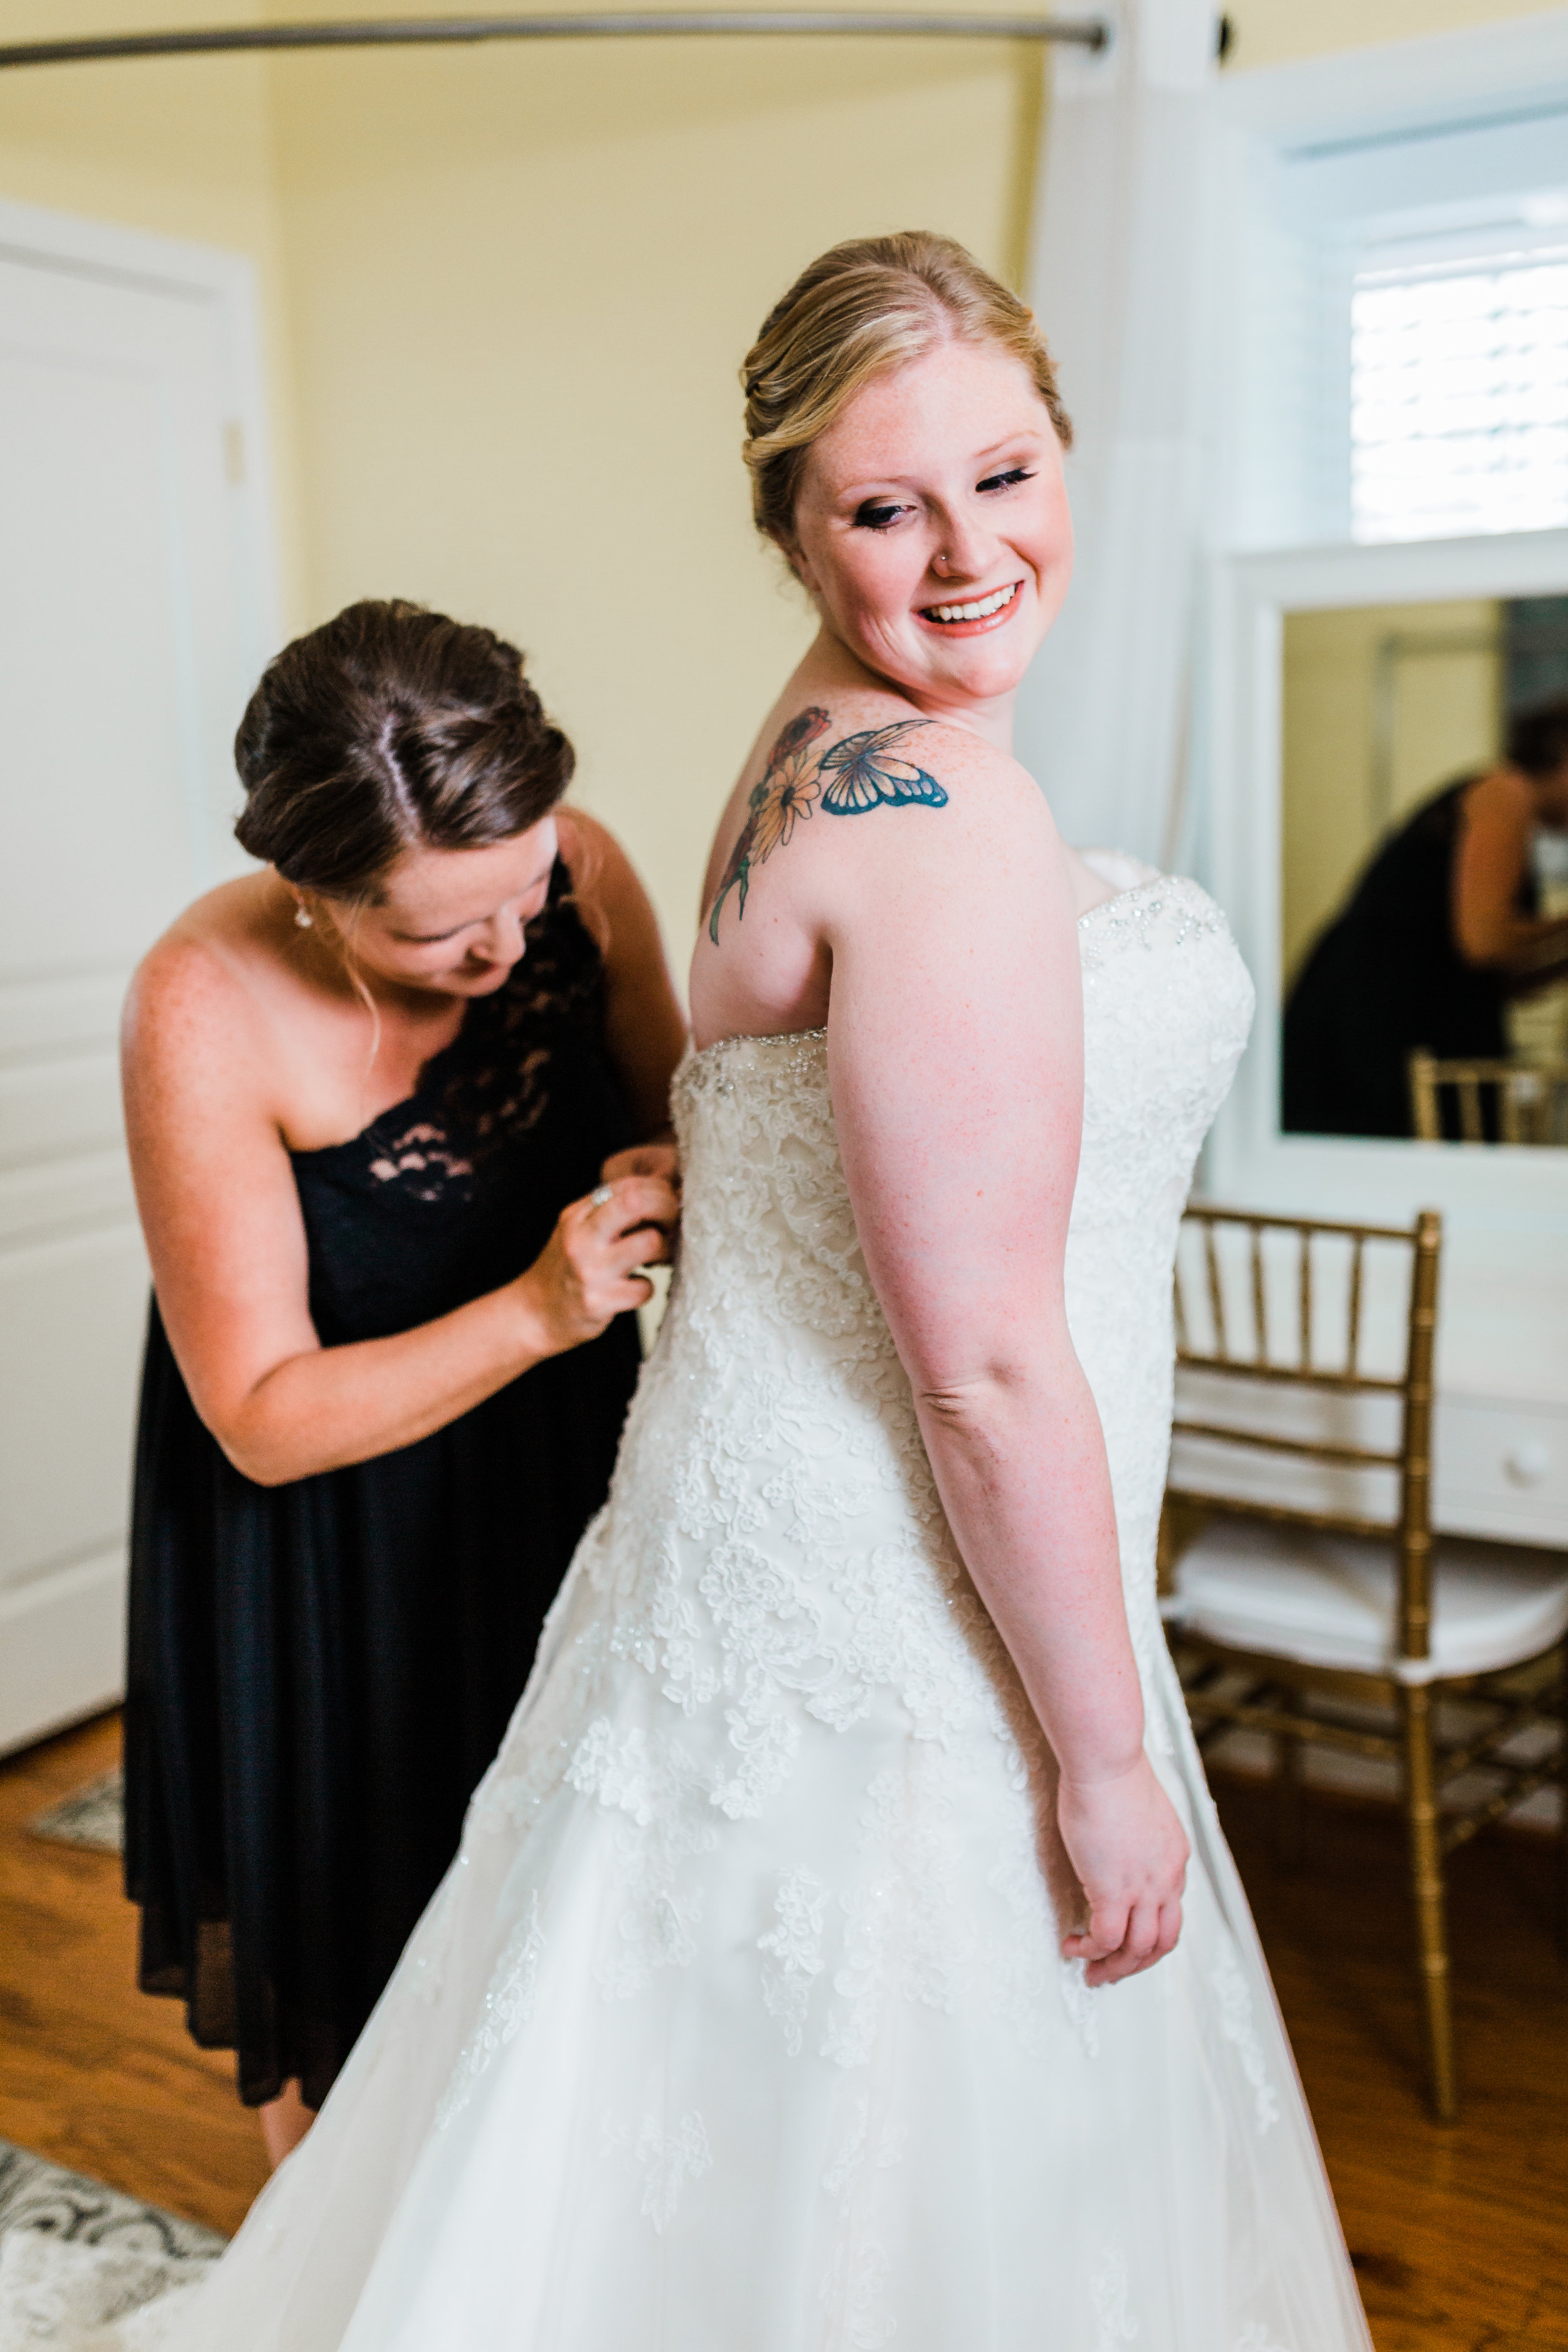 bride with her matron of honor getting her dress on - kurtz's beach wedding - maryland wedding photographer